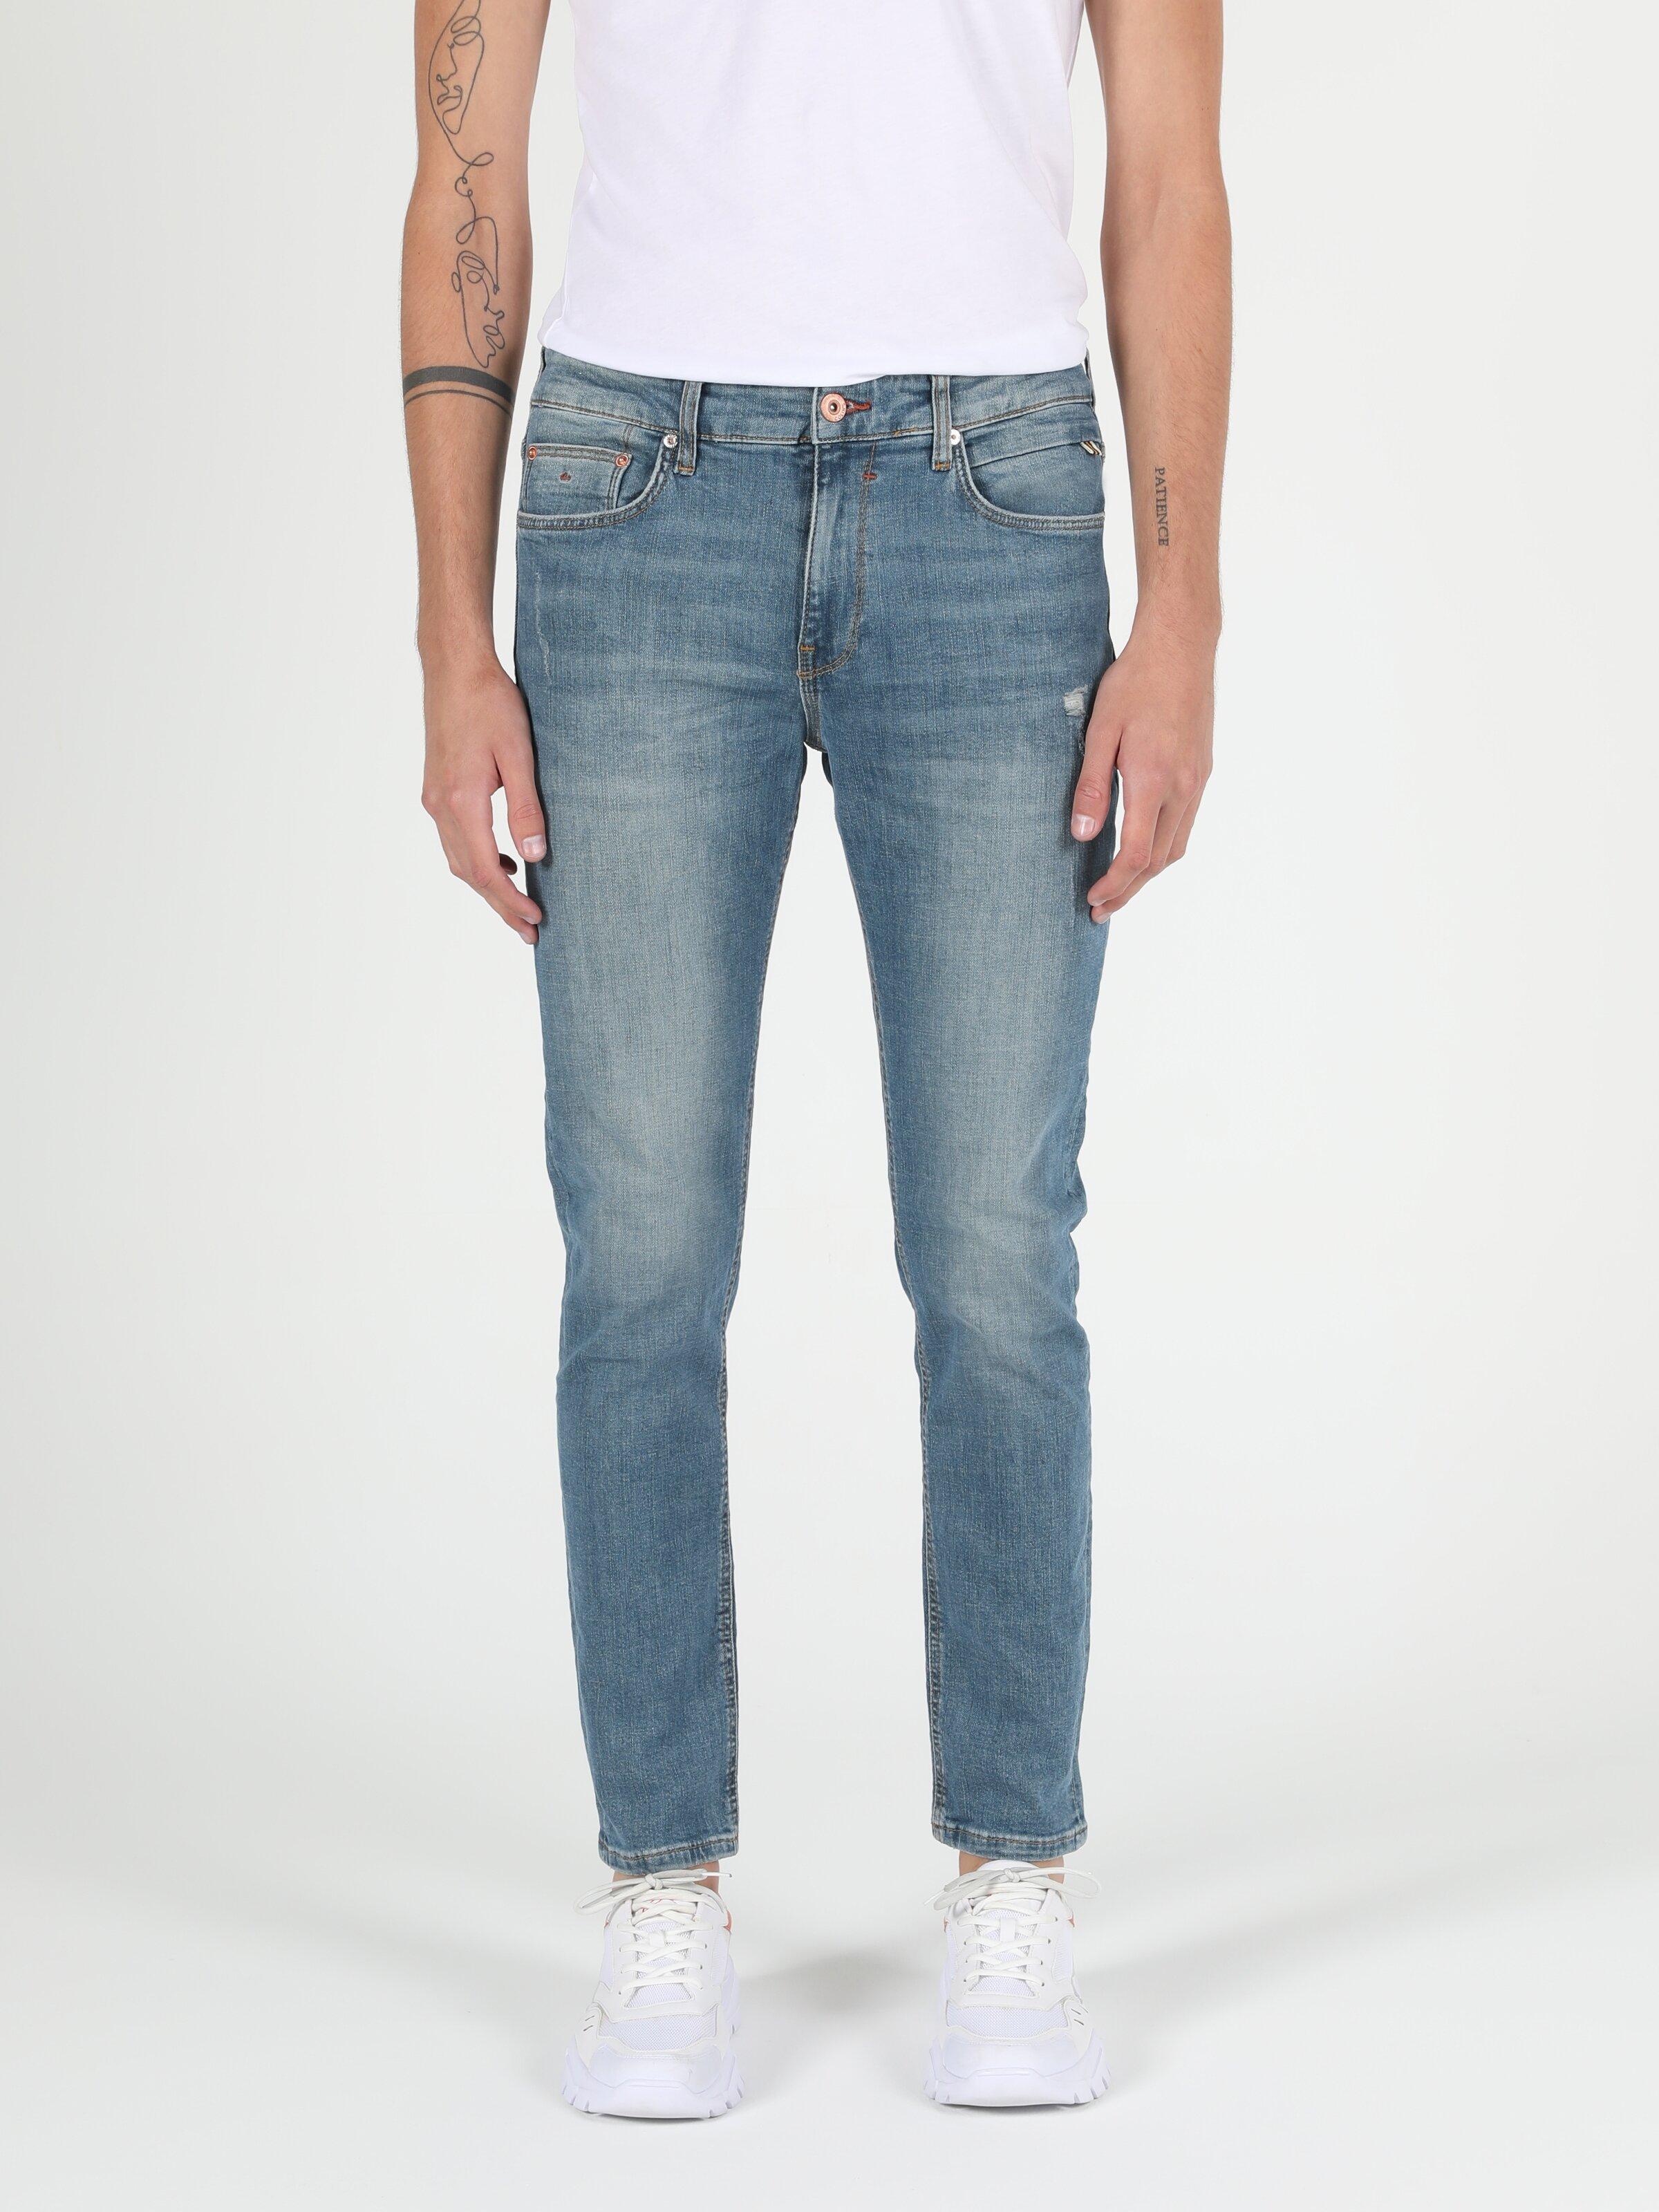 035 Ryan Yüksek Bel Dar Paça Skinny Fit Mavi Erkek Jean Pantolon